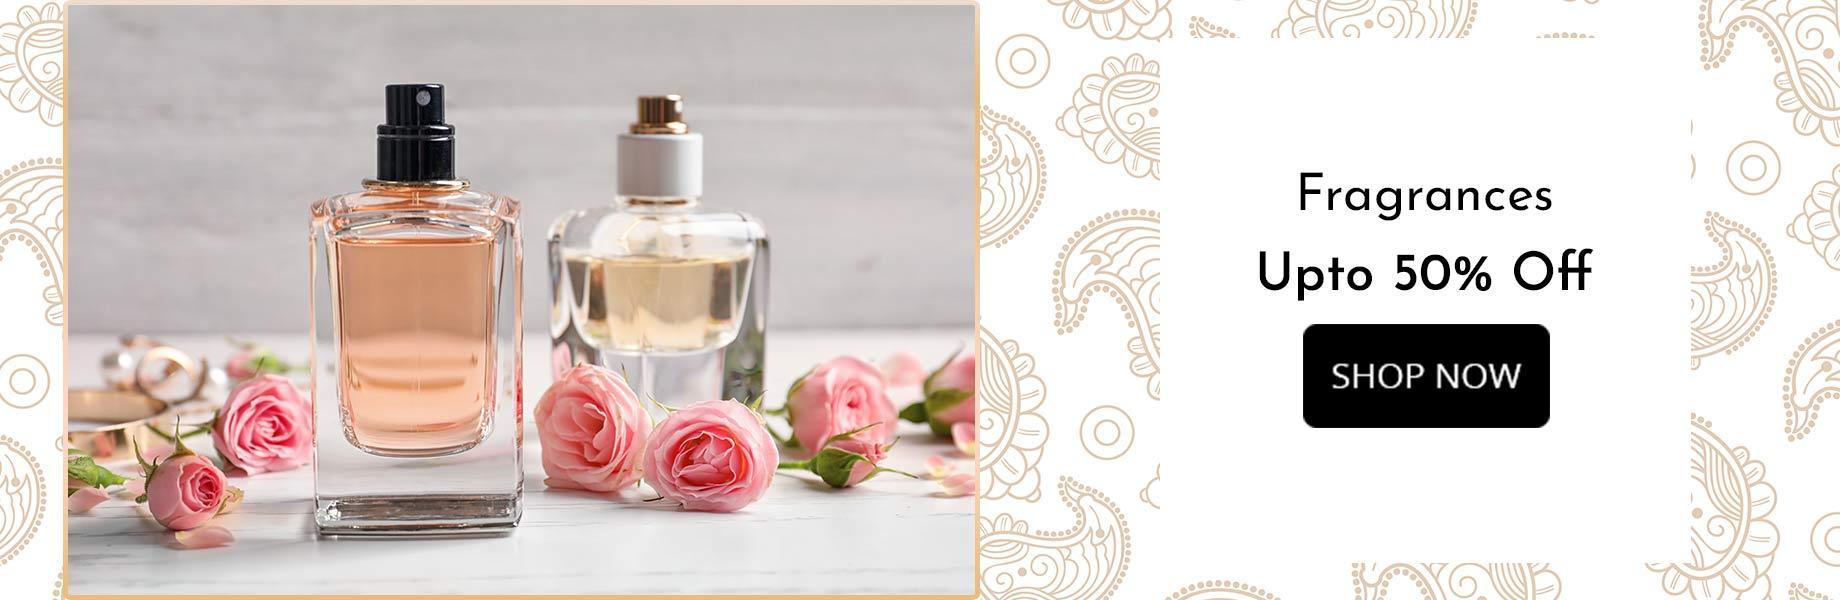 fragrances_web.jpg